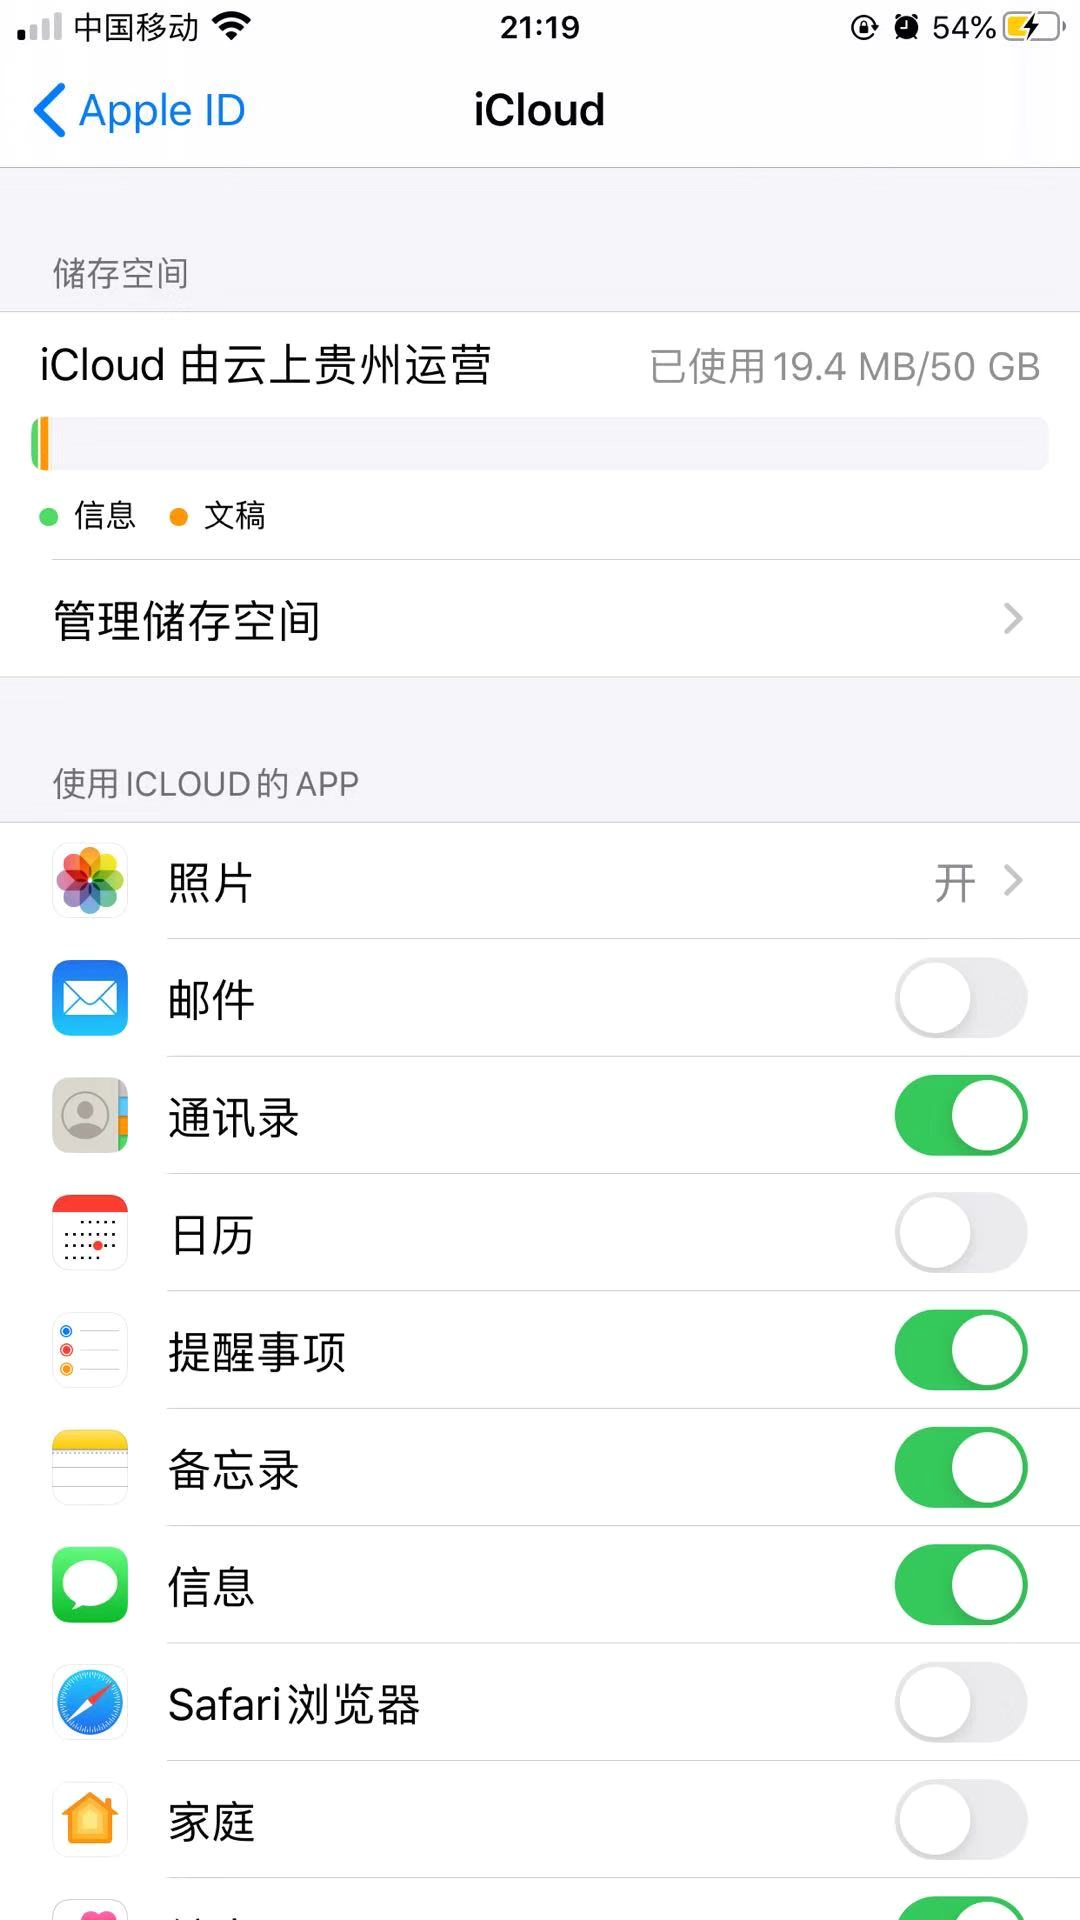 iPhone照片無法上傳到iCloud - Apple 社區